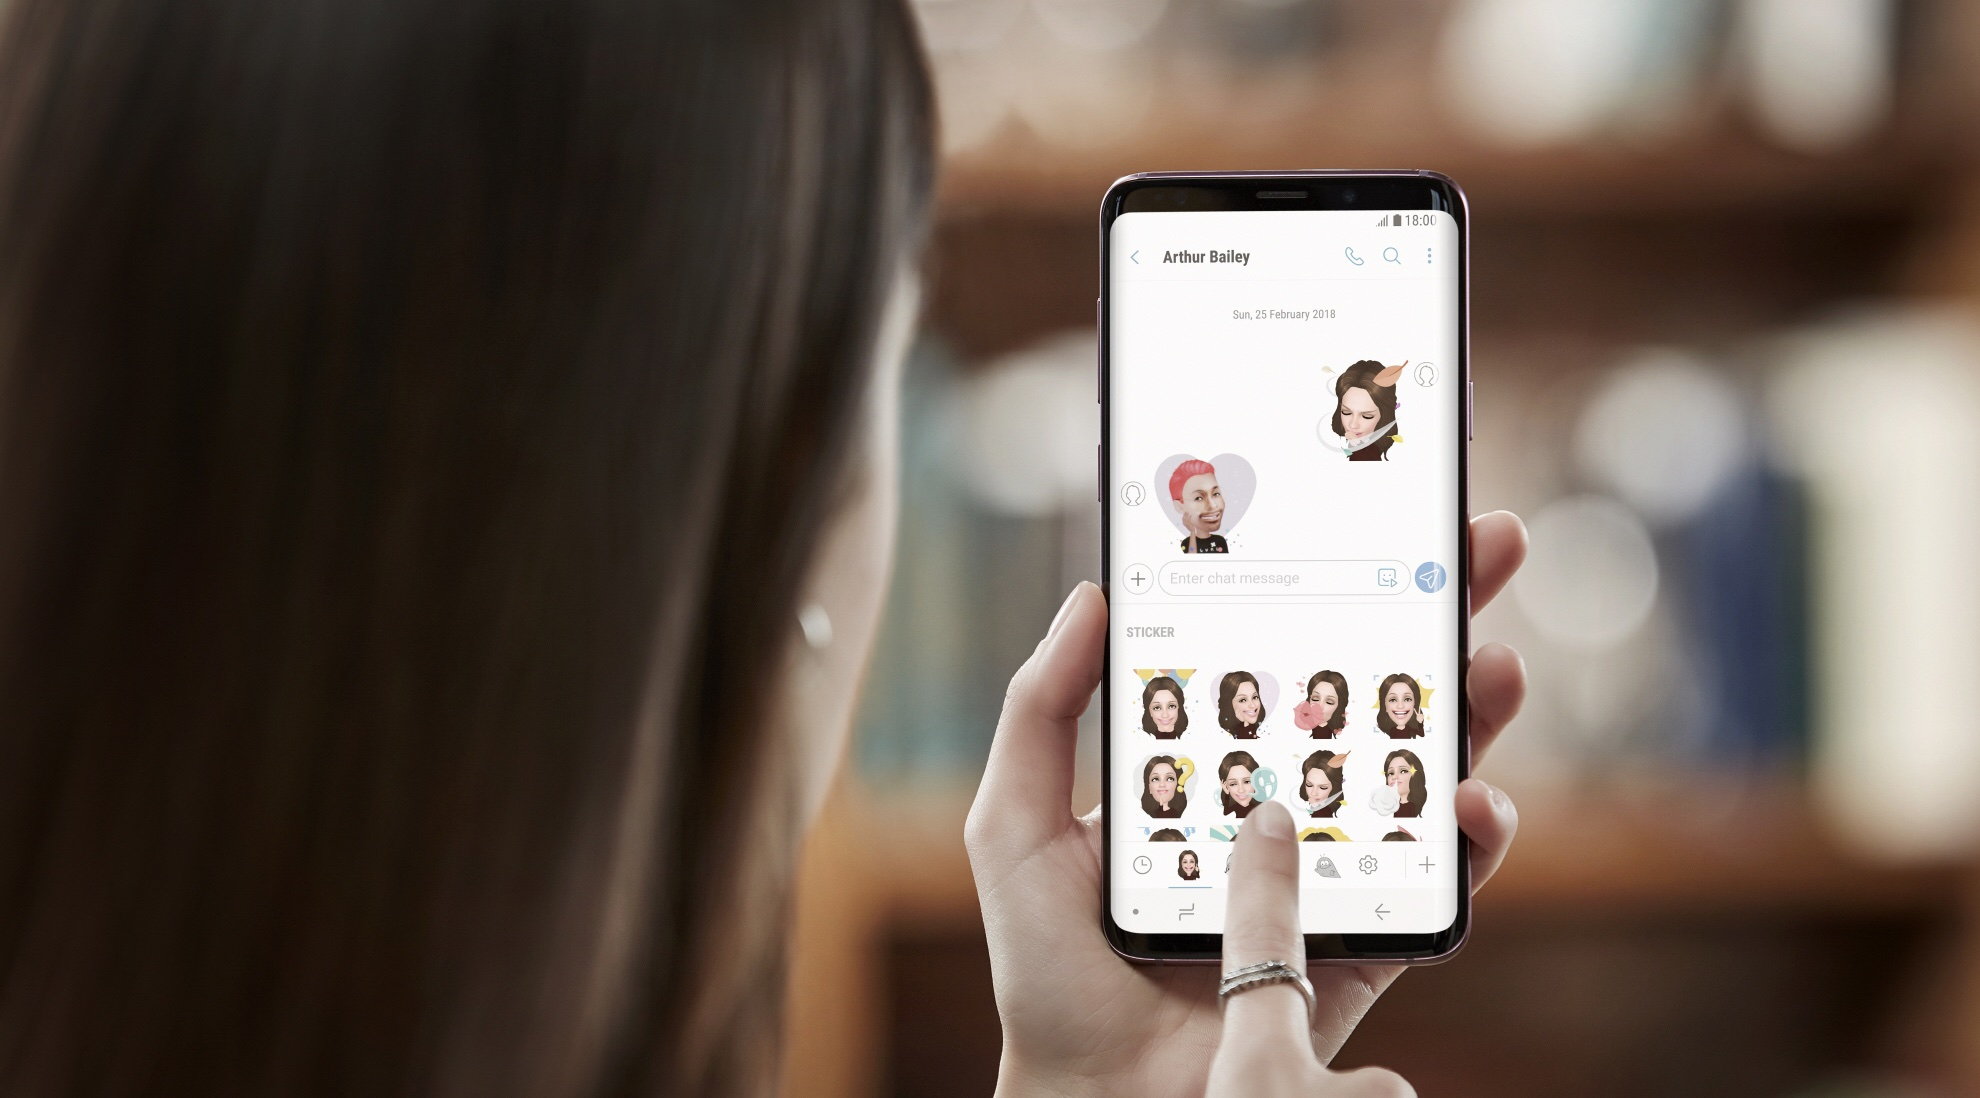 Samsung-Galaxy-S9-AR-Emoji